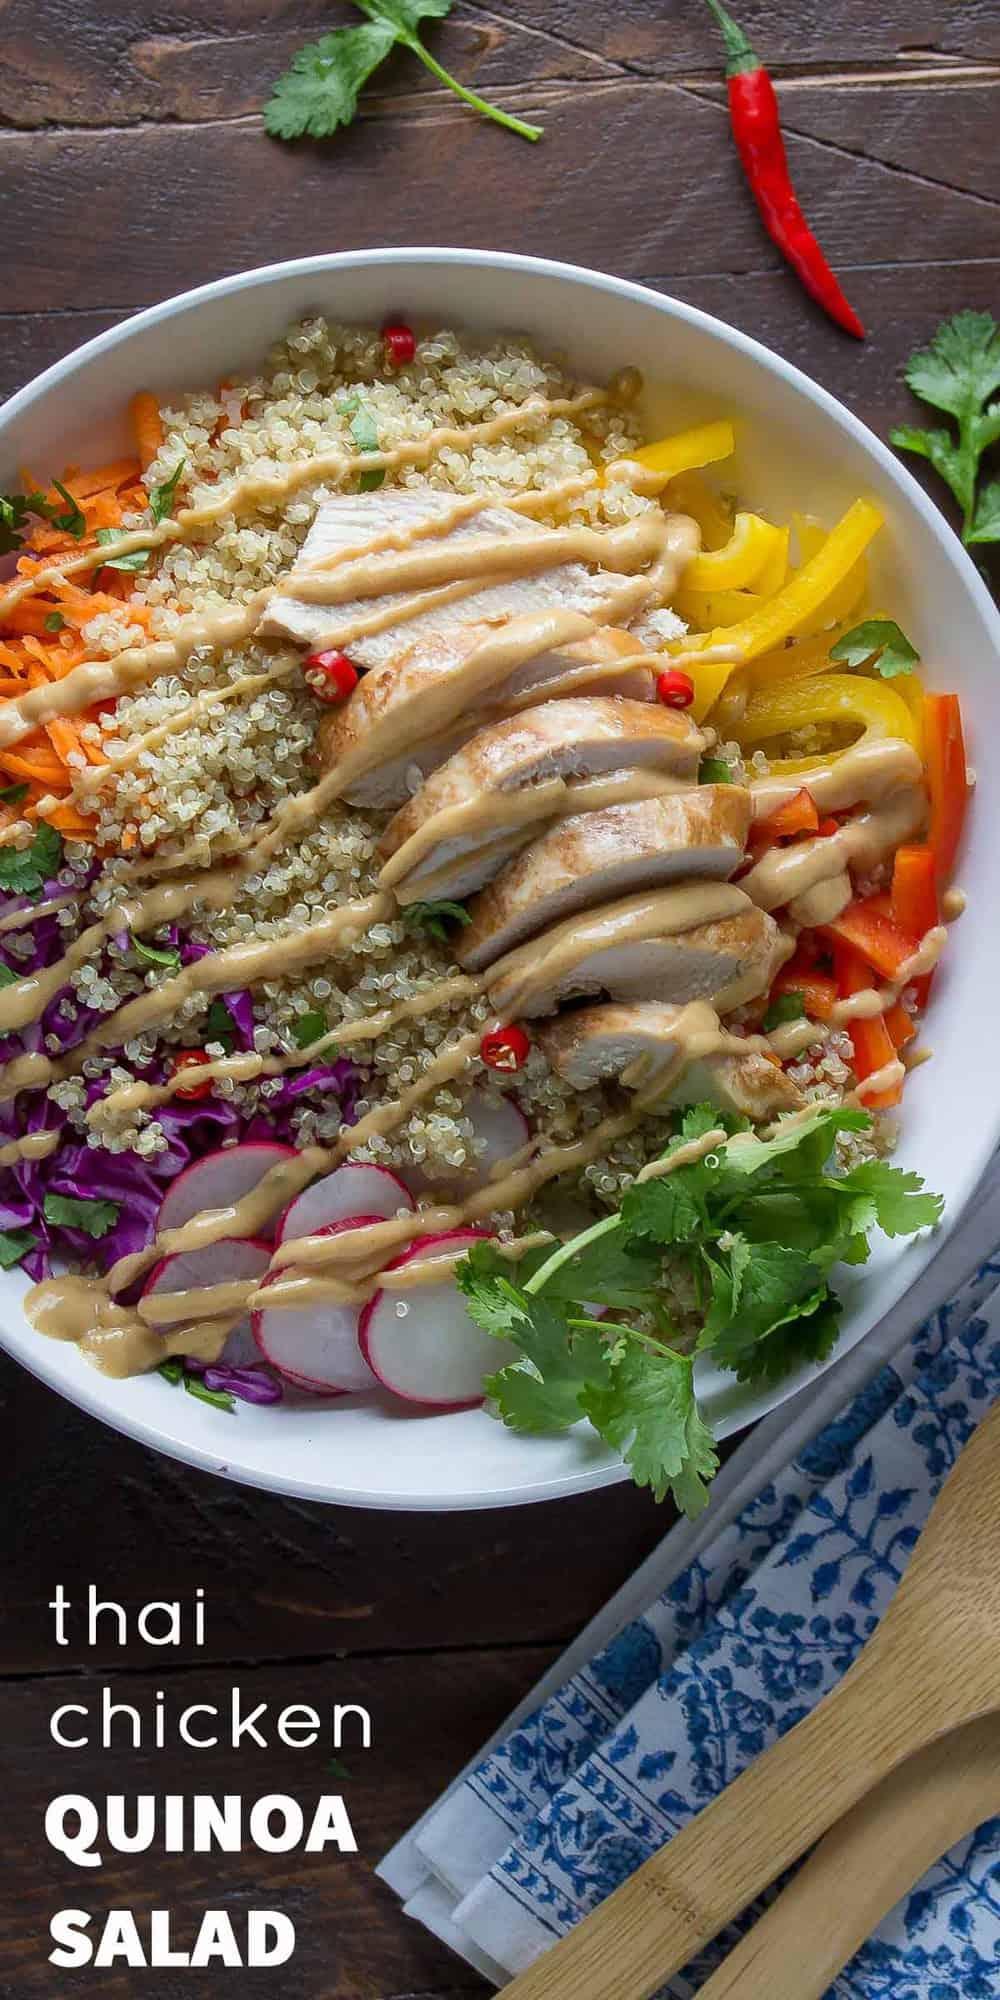 Thai Chicken Quinoa Salad With Peanut Dressing